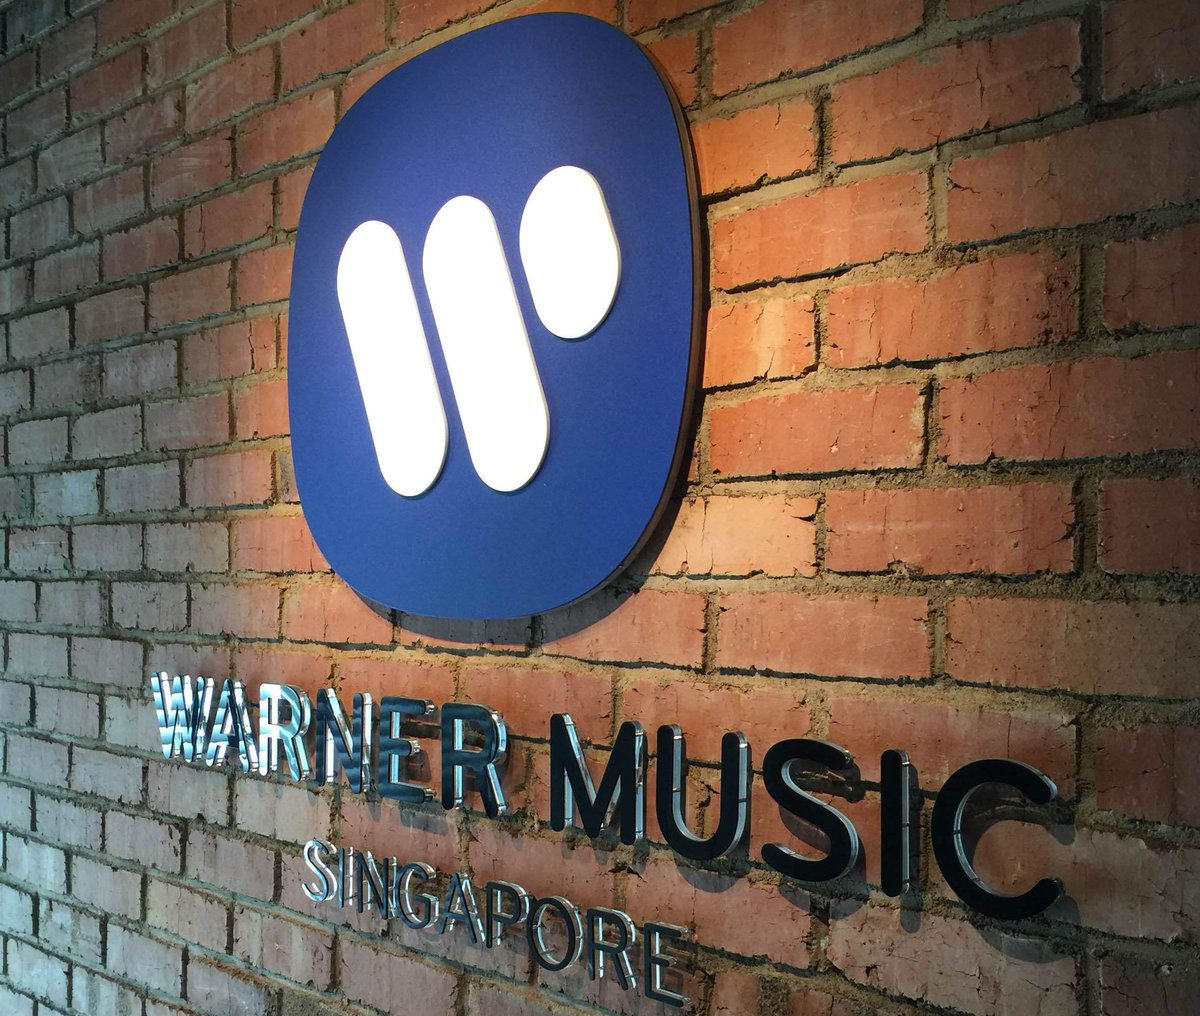 """UNTOUCHABLE"" The EP featuring @LucaDayz, @TommyOOrgan, @Salio_Official, @LegendaryMQ, @Turreekk, @BigTymeOfficial, @WestCrav, @BateNateYSL, @MadMax_BGOD, coming out this July via family @WarnerMusicSG  #NewMusic #EP #Music #Rap #HipHop #Music #Artist #Singer #Rapper #Retweet #RT"